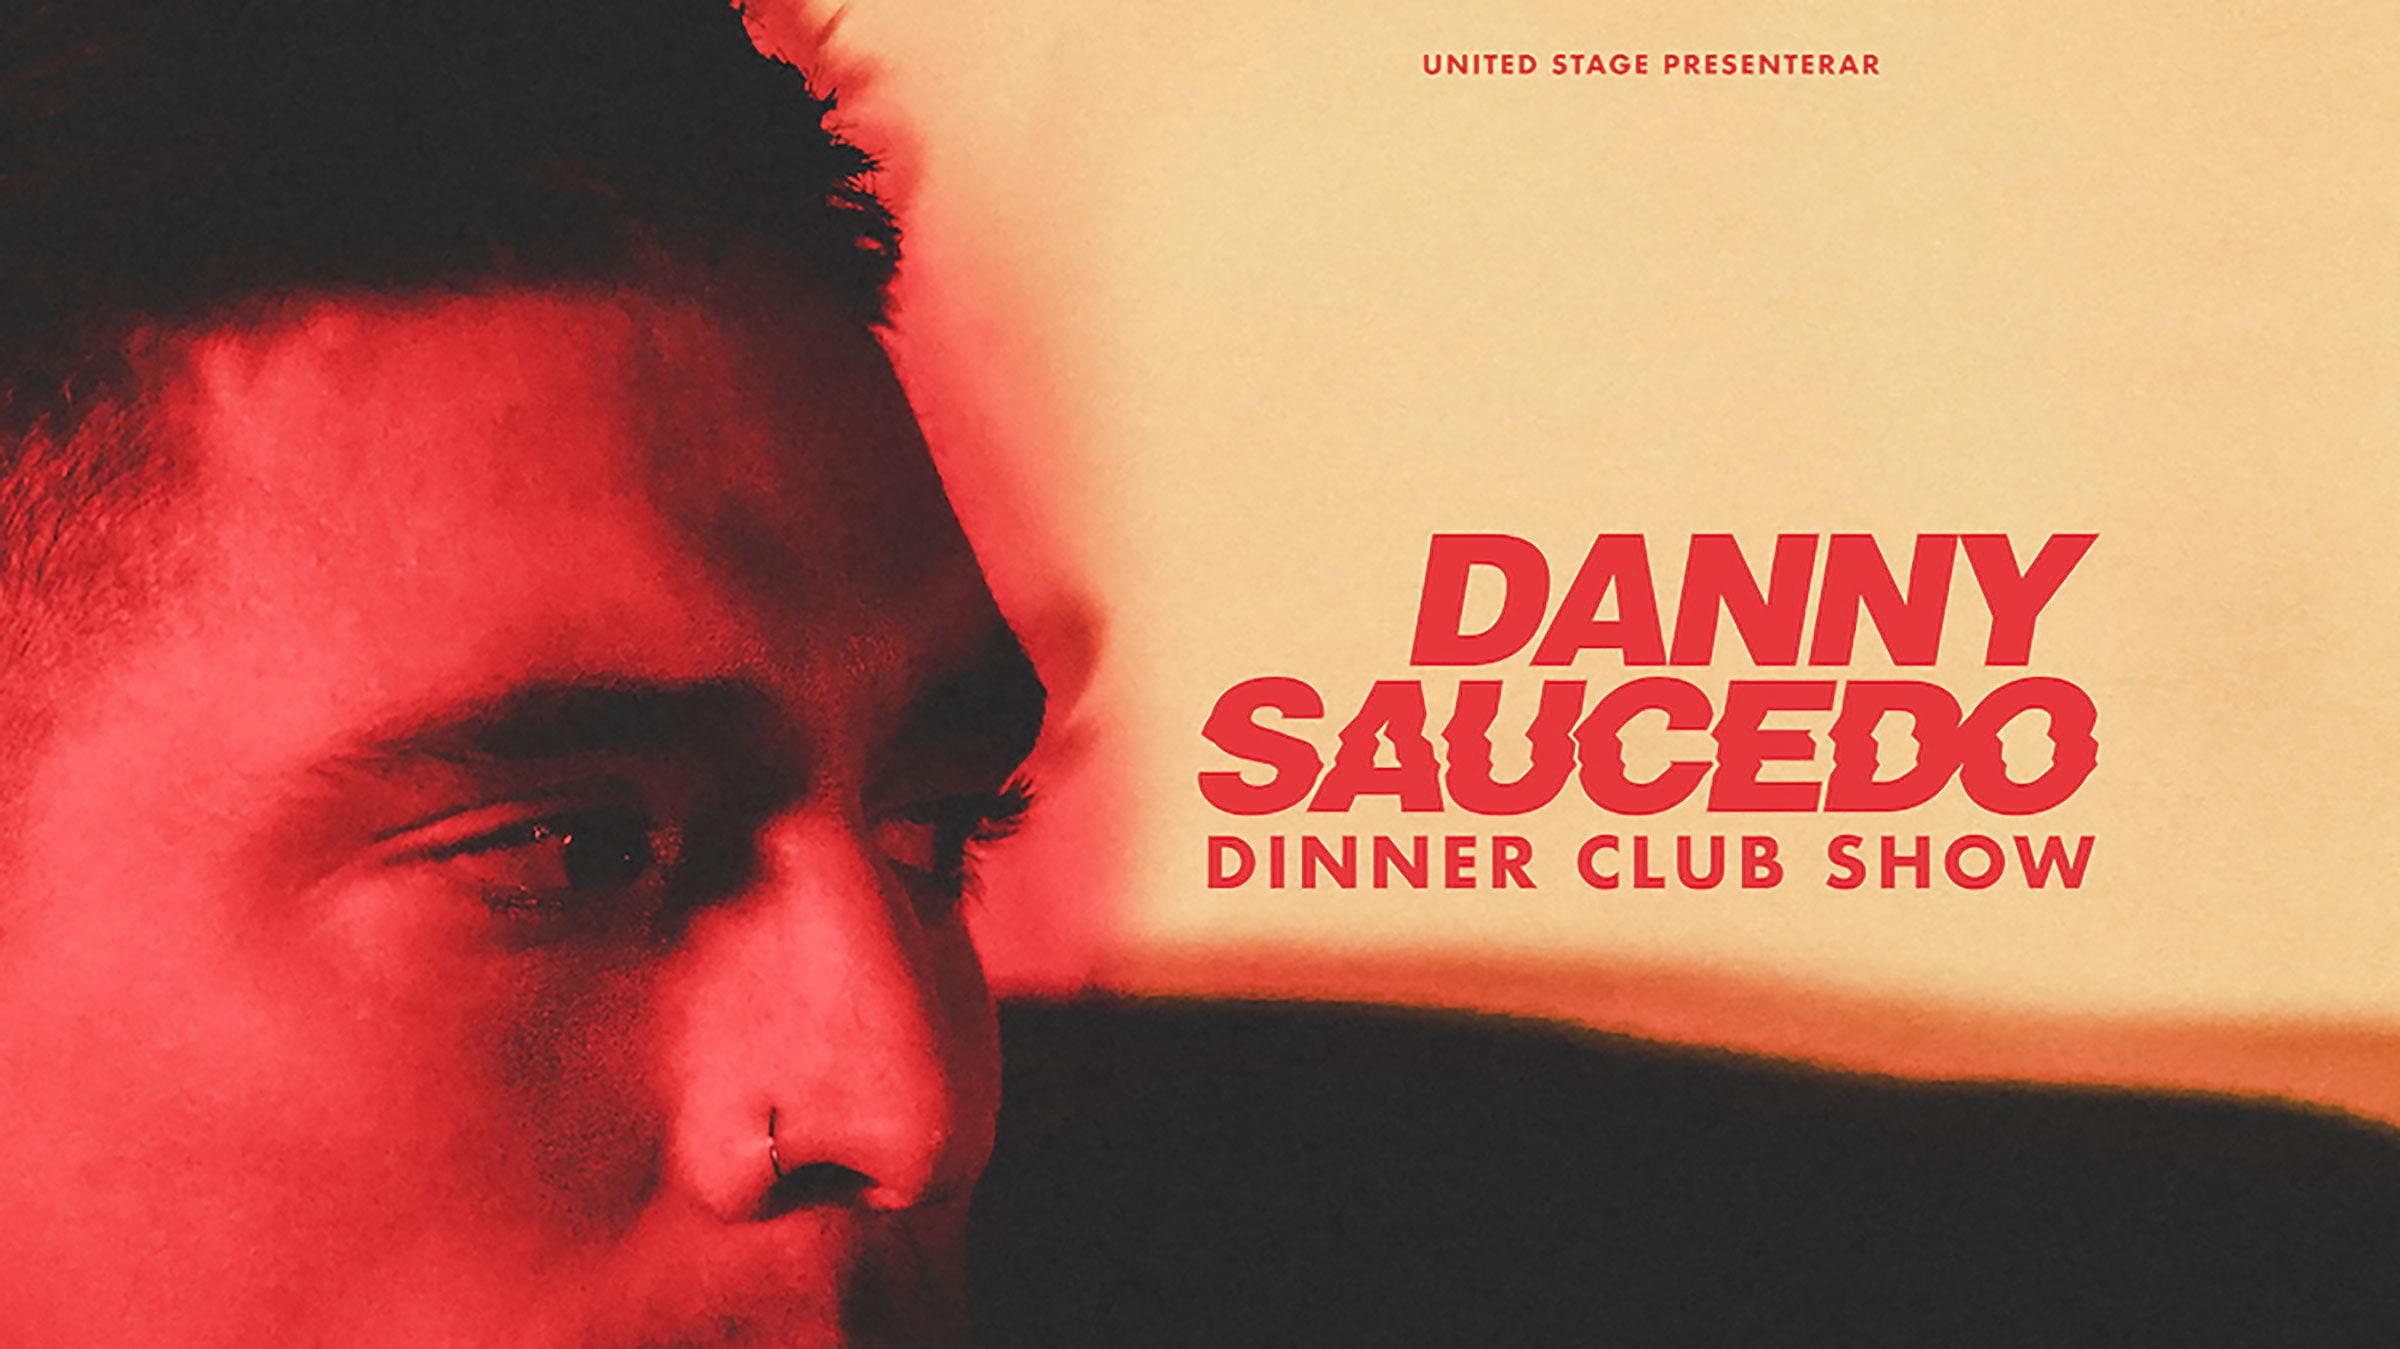 Danny Saucedo gör dinner show på Berns